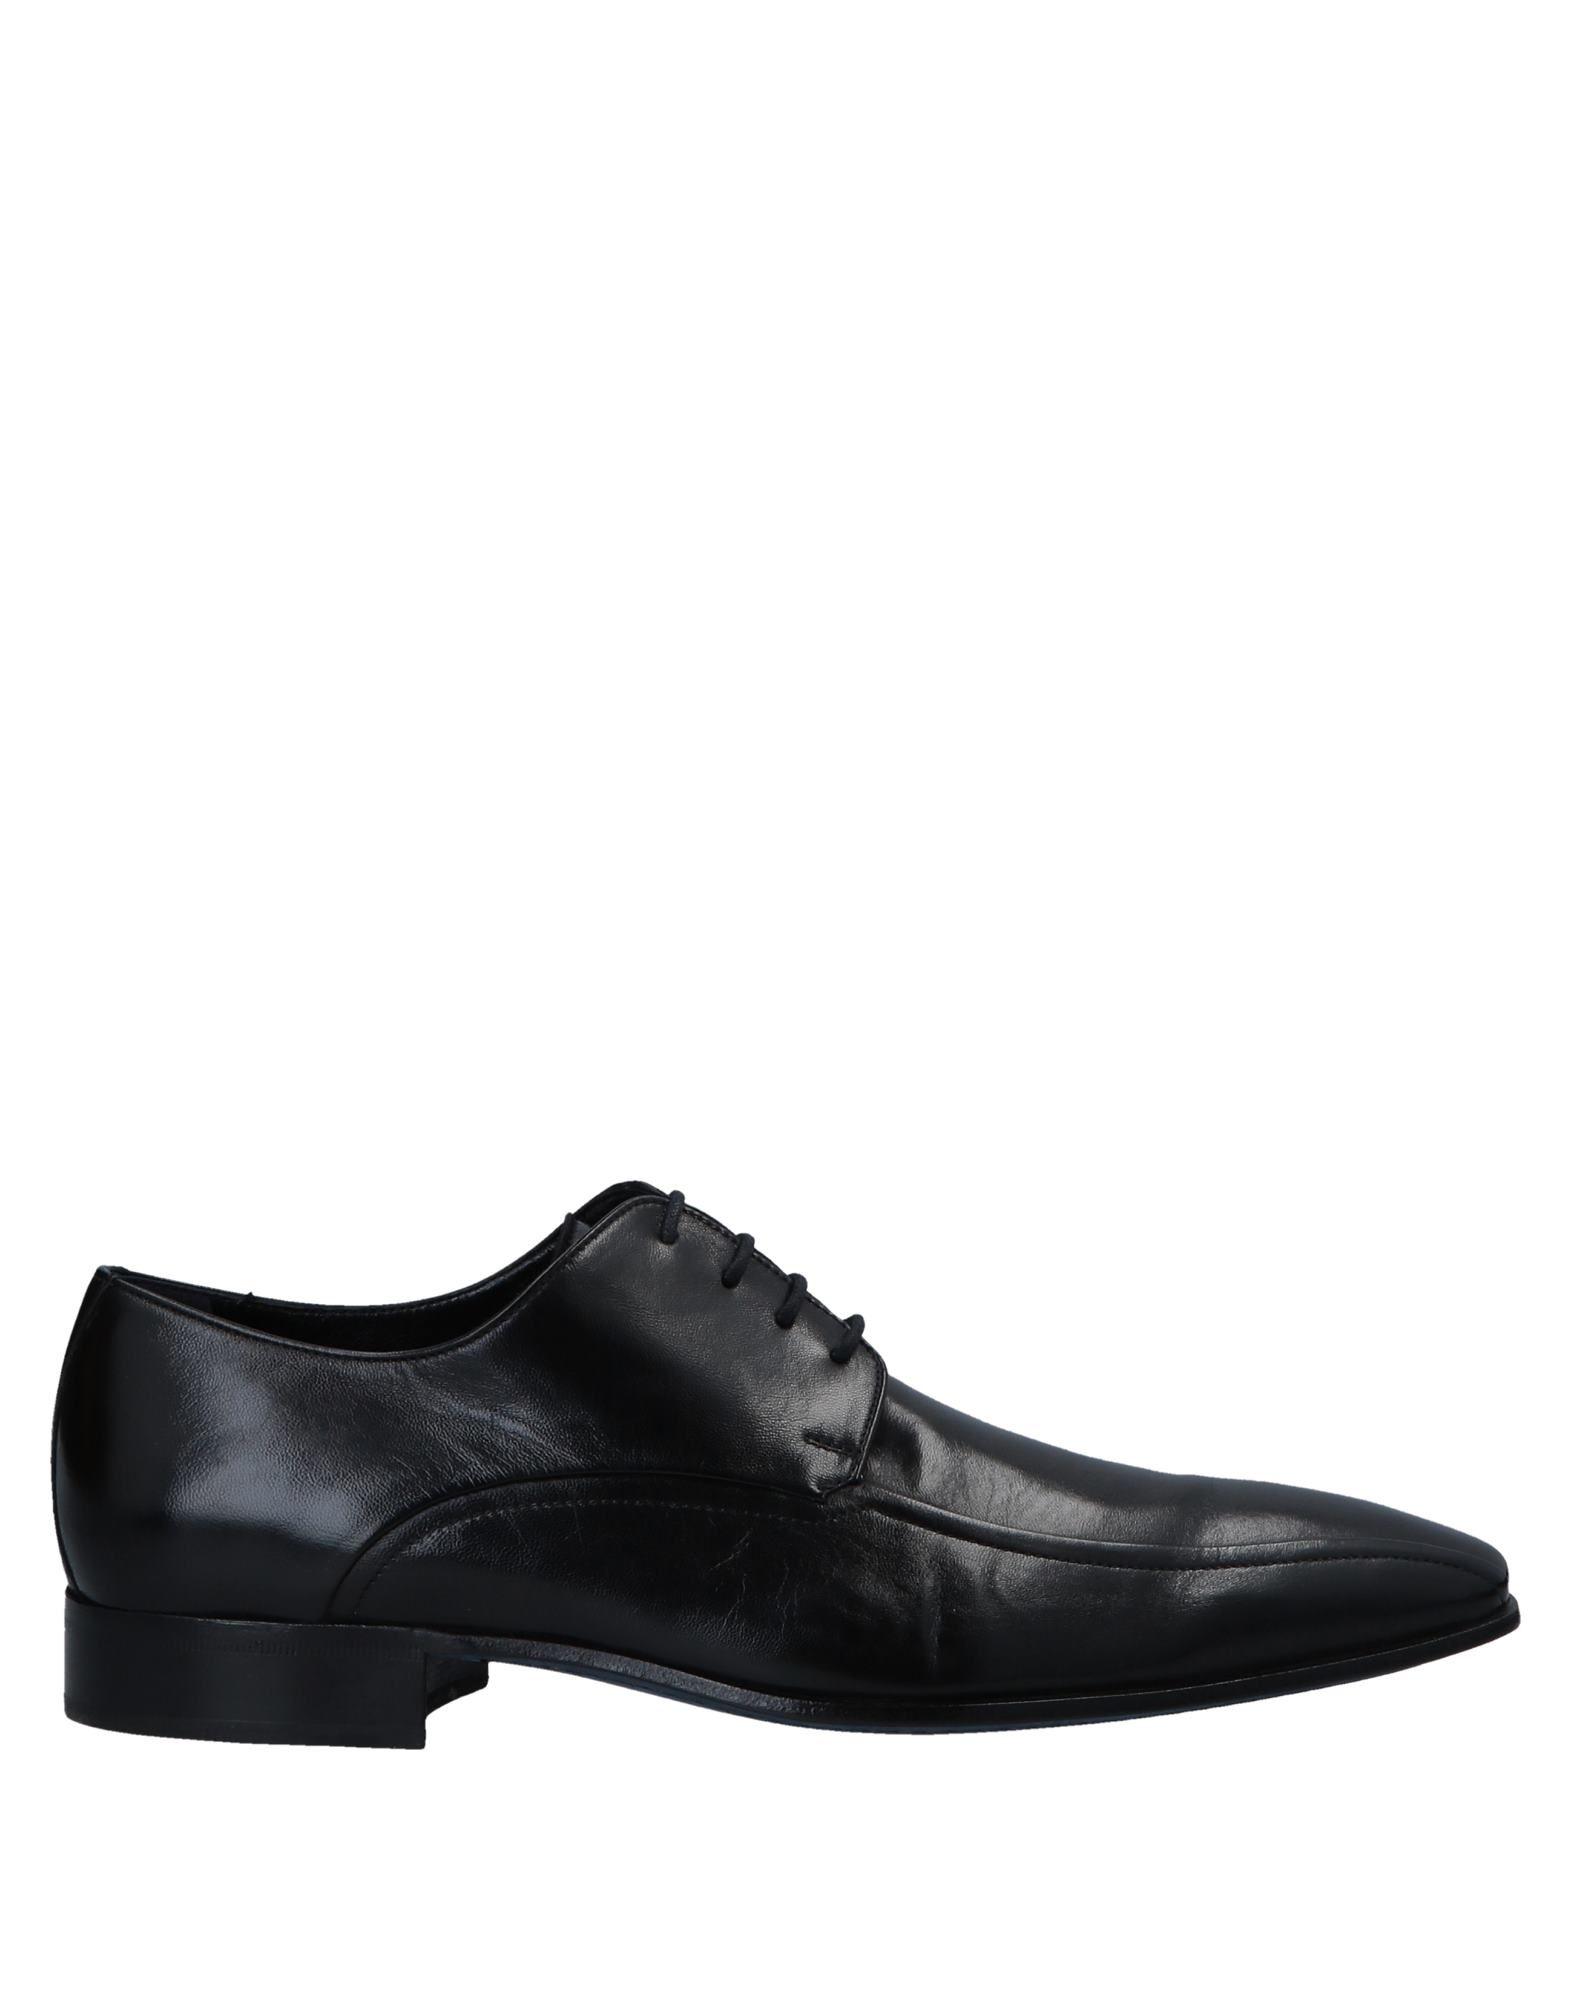 CALPIERRE Обувь на шнурках calpierre обувь на шнурках